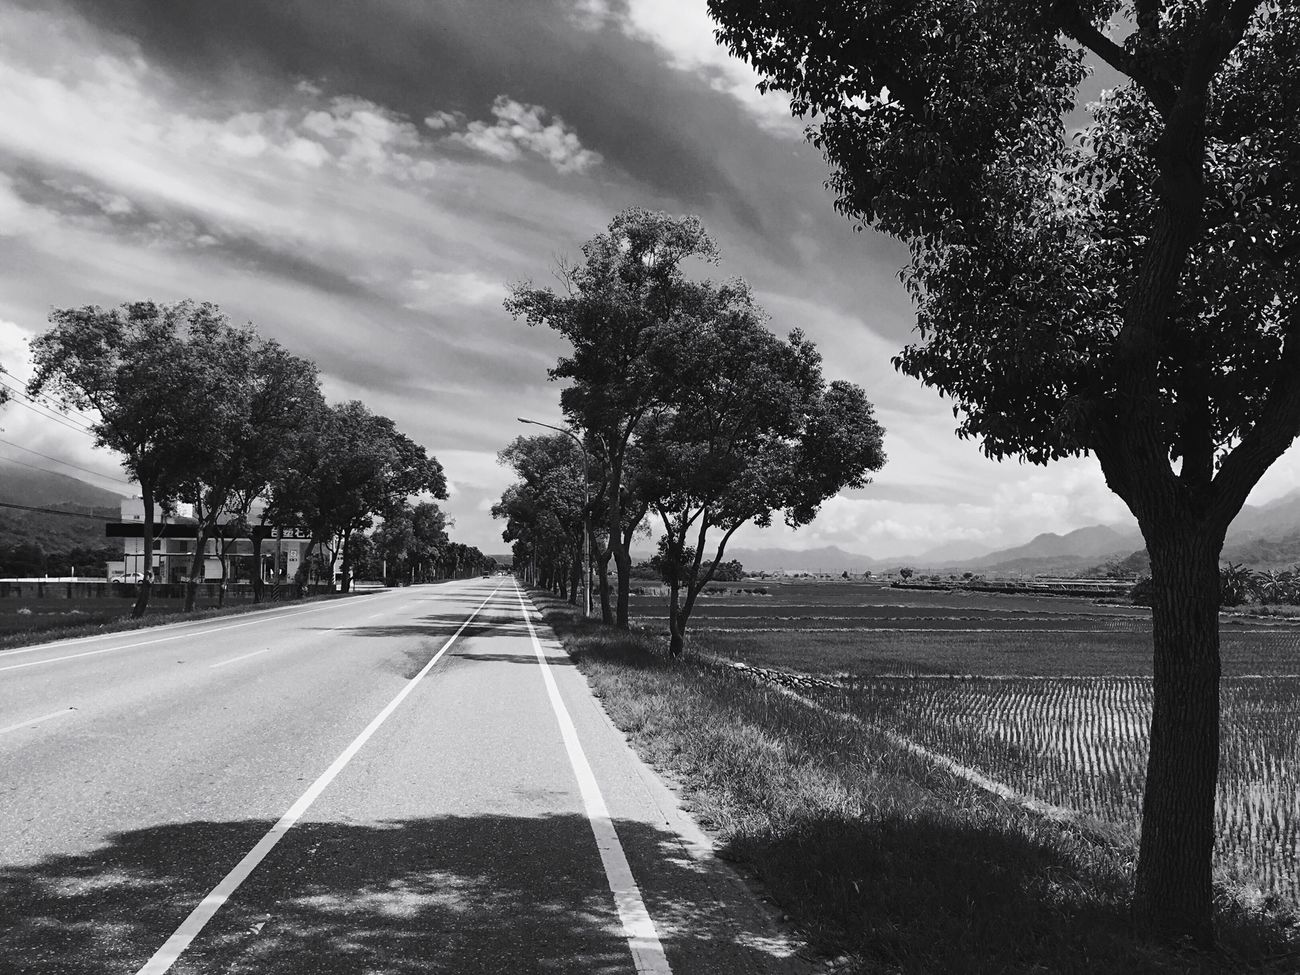 Shades Of Grey Blackandwhite Black & White Blackandwhite Photography Streetphotography IPhoneography OpenEdit Monochrome